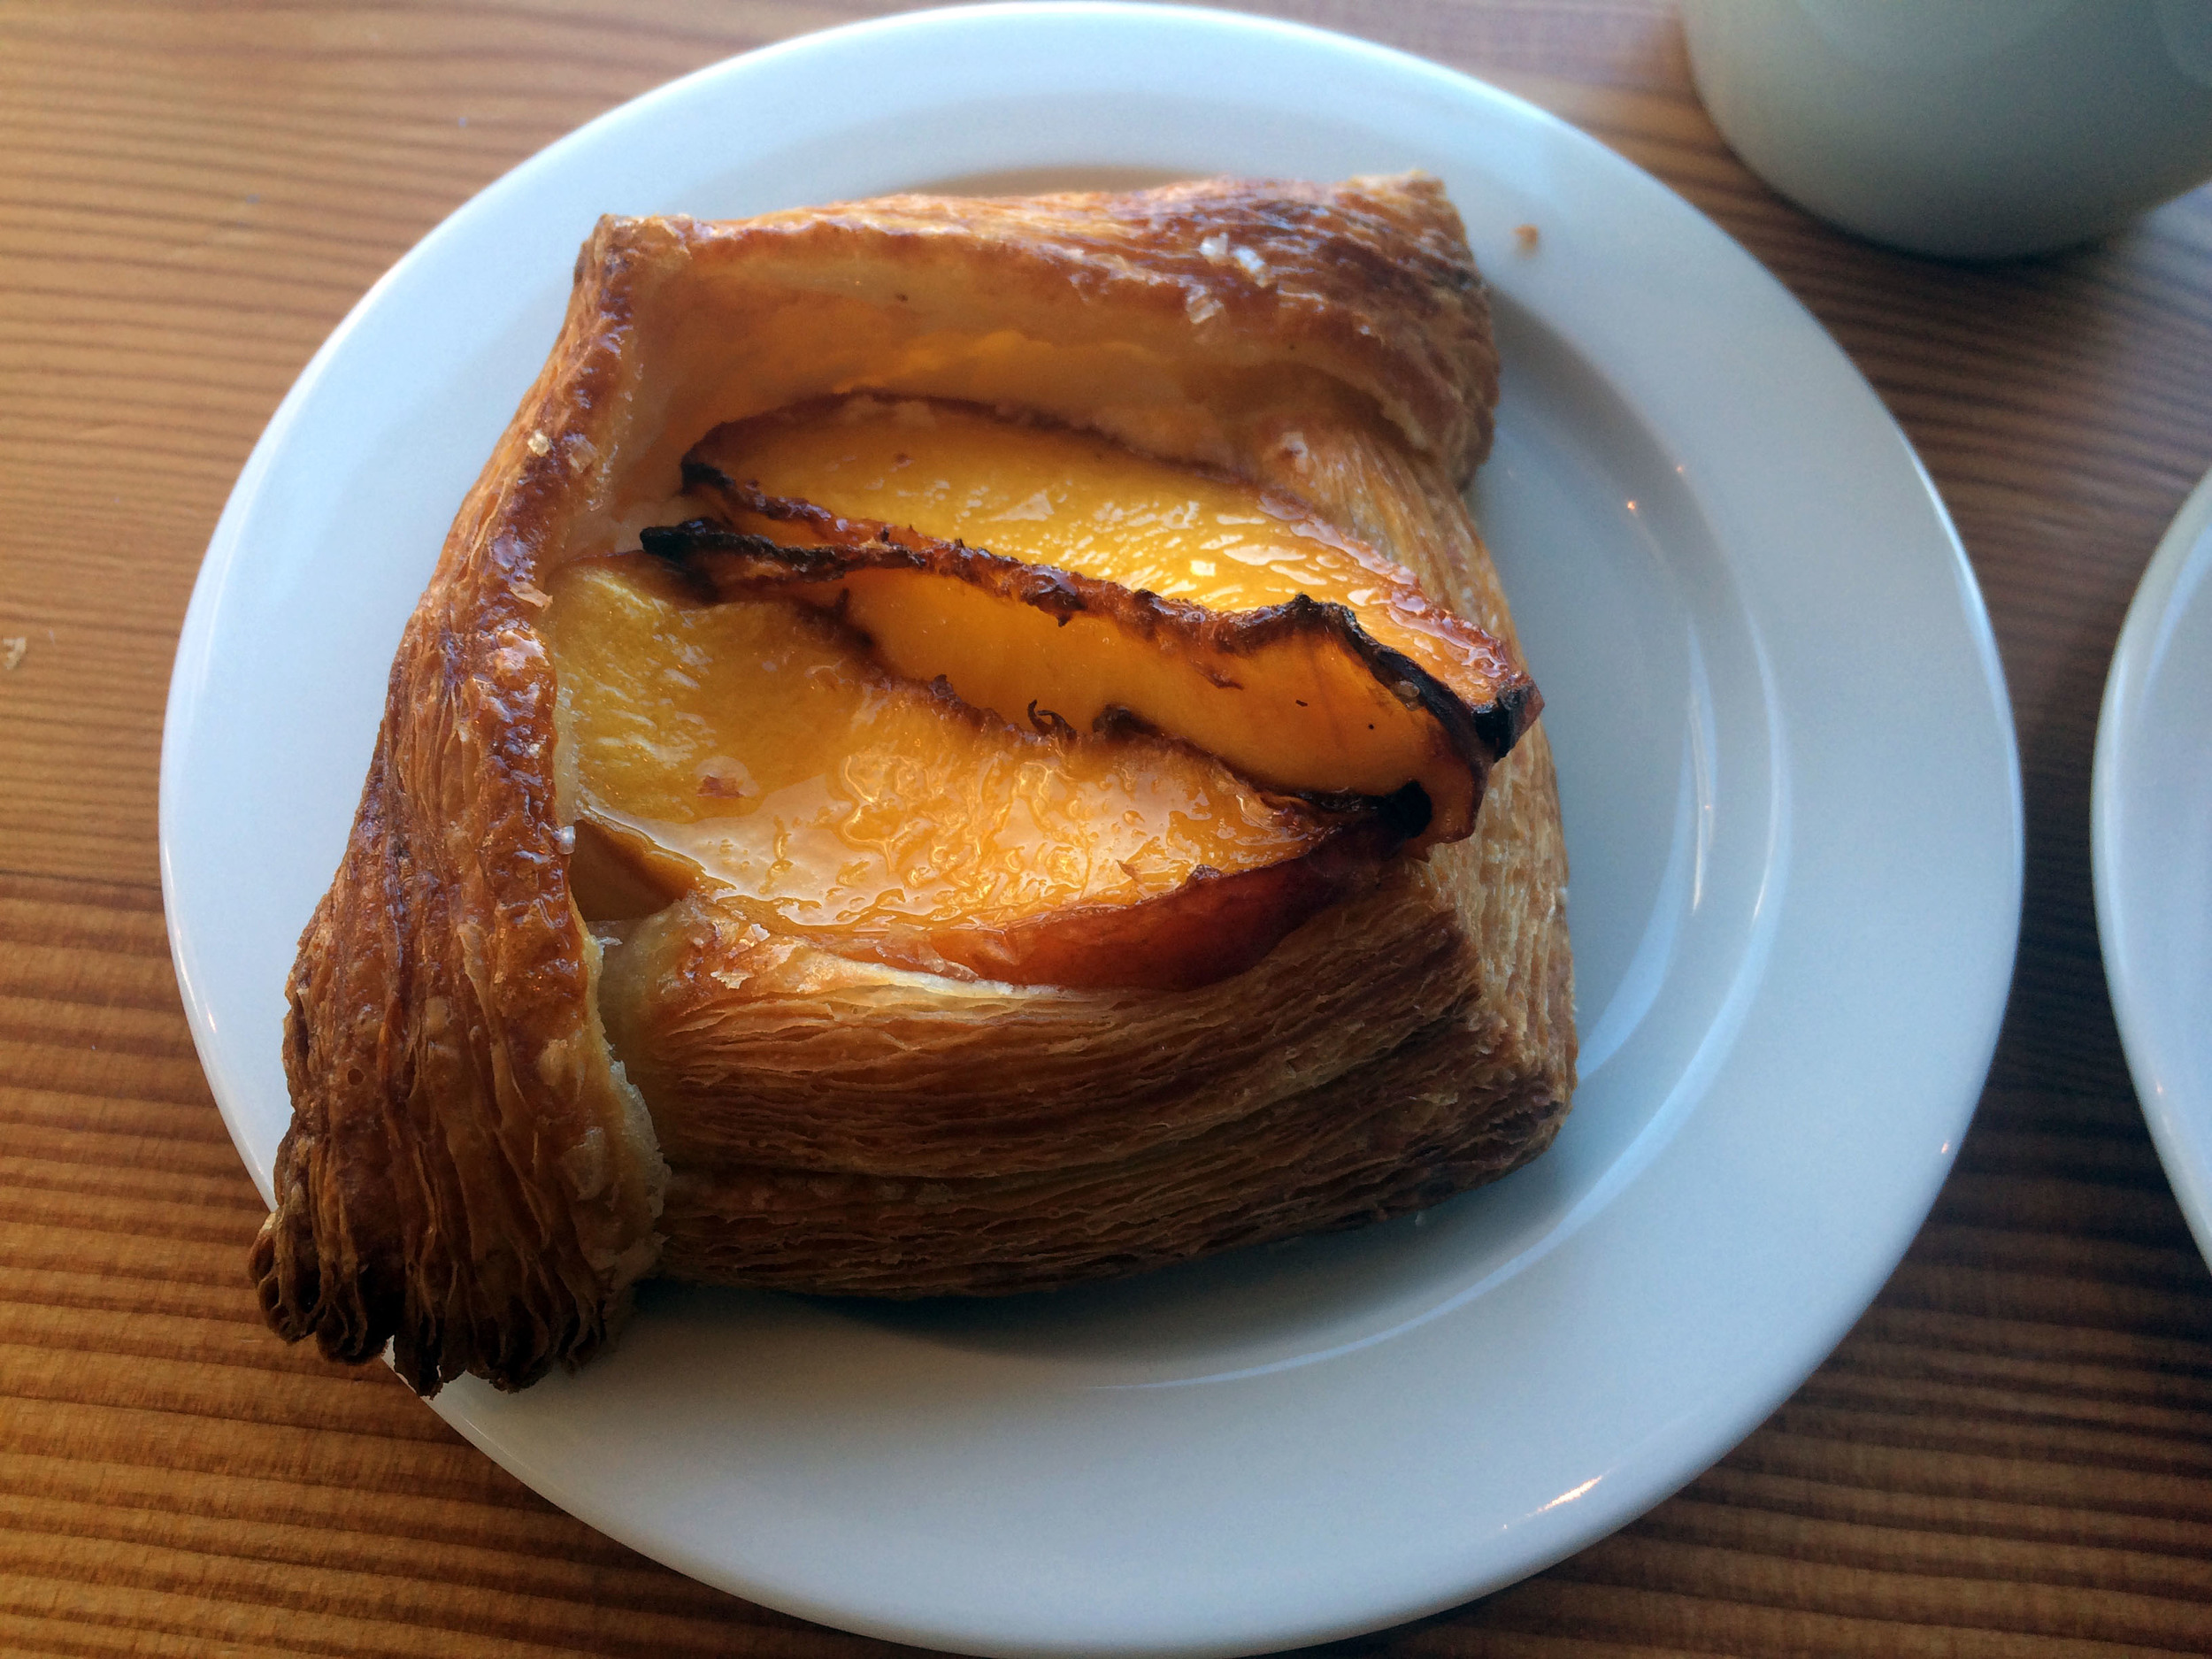 Seasonal croissant with nectarines